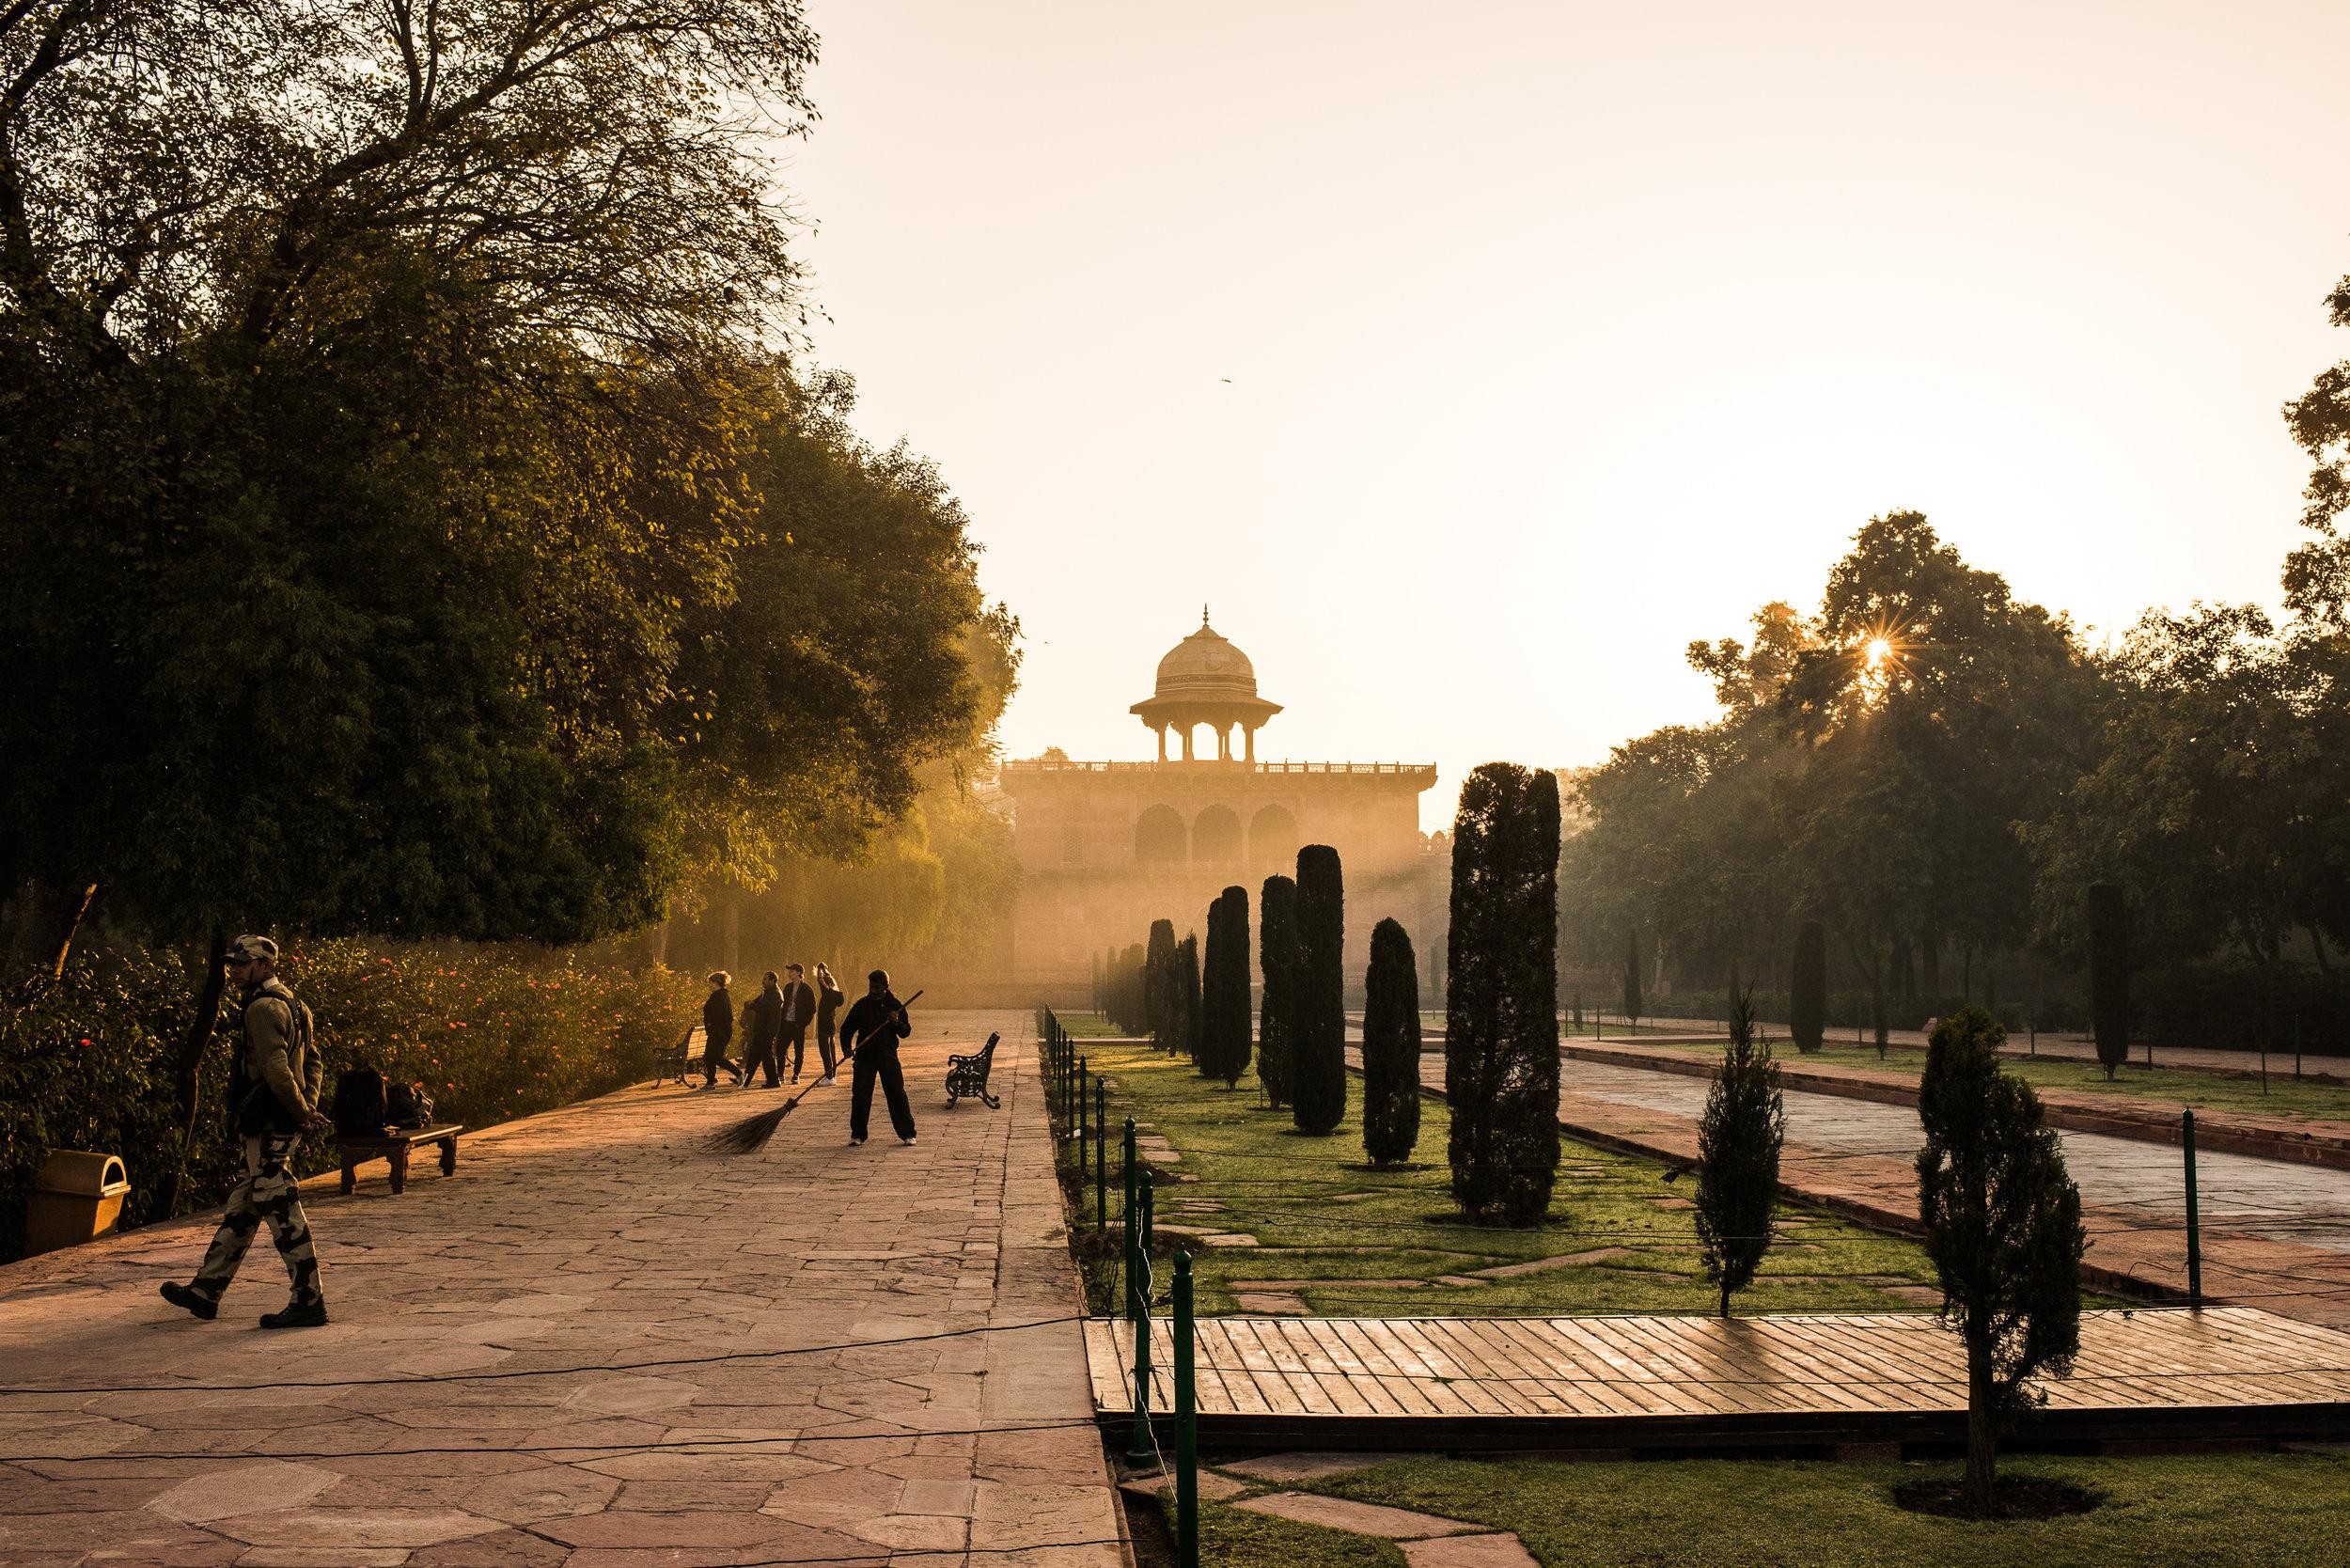 India_Humanitarian_Photography_DSC_7881.jpg